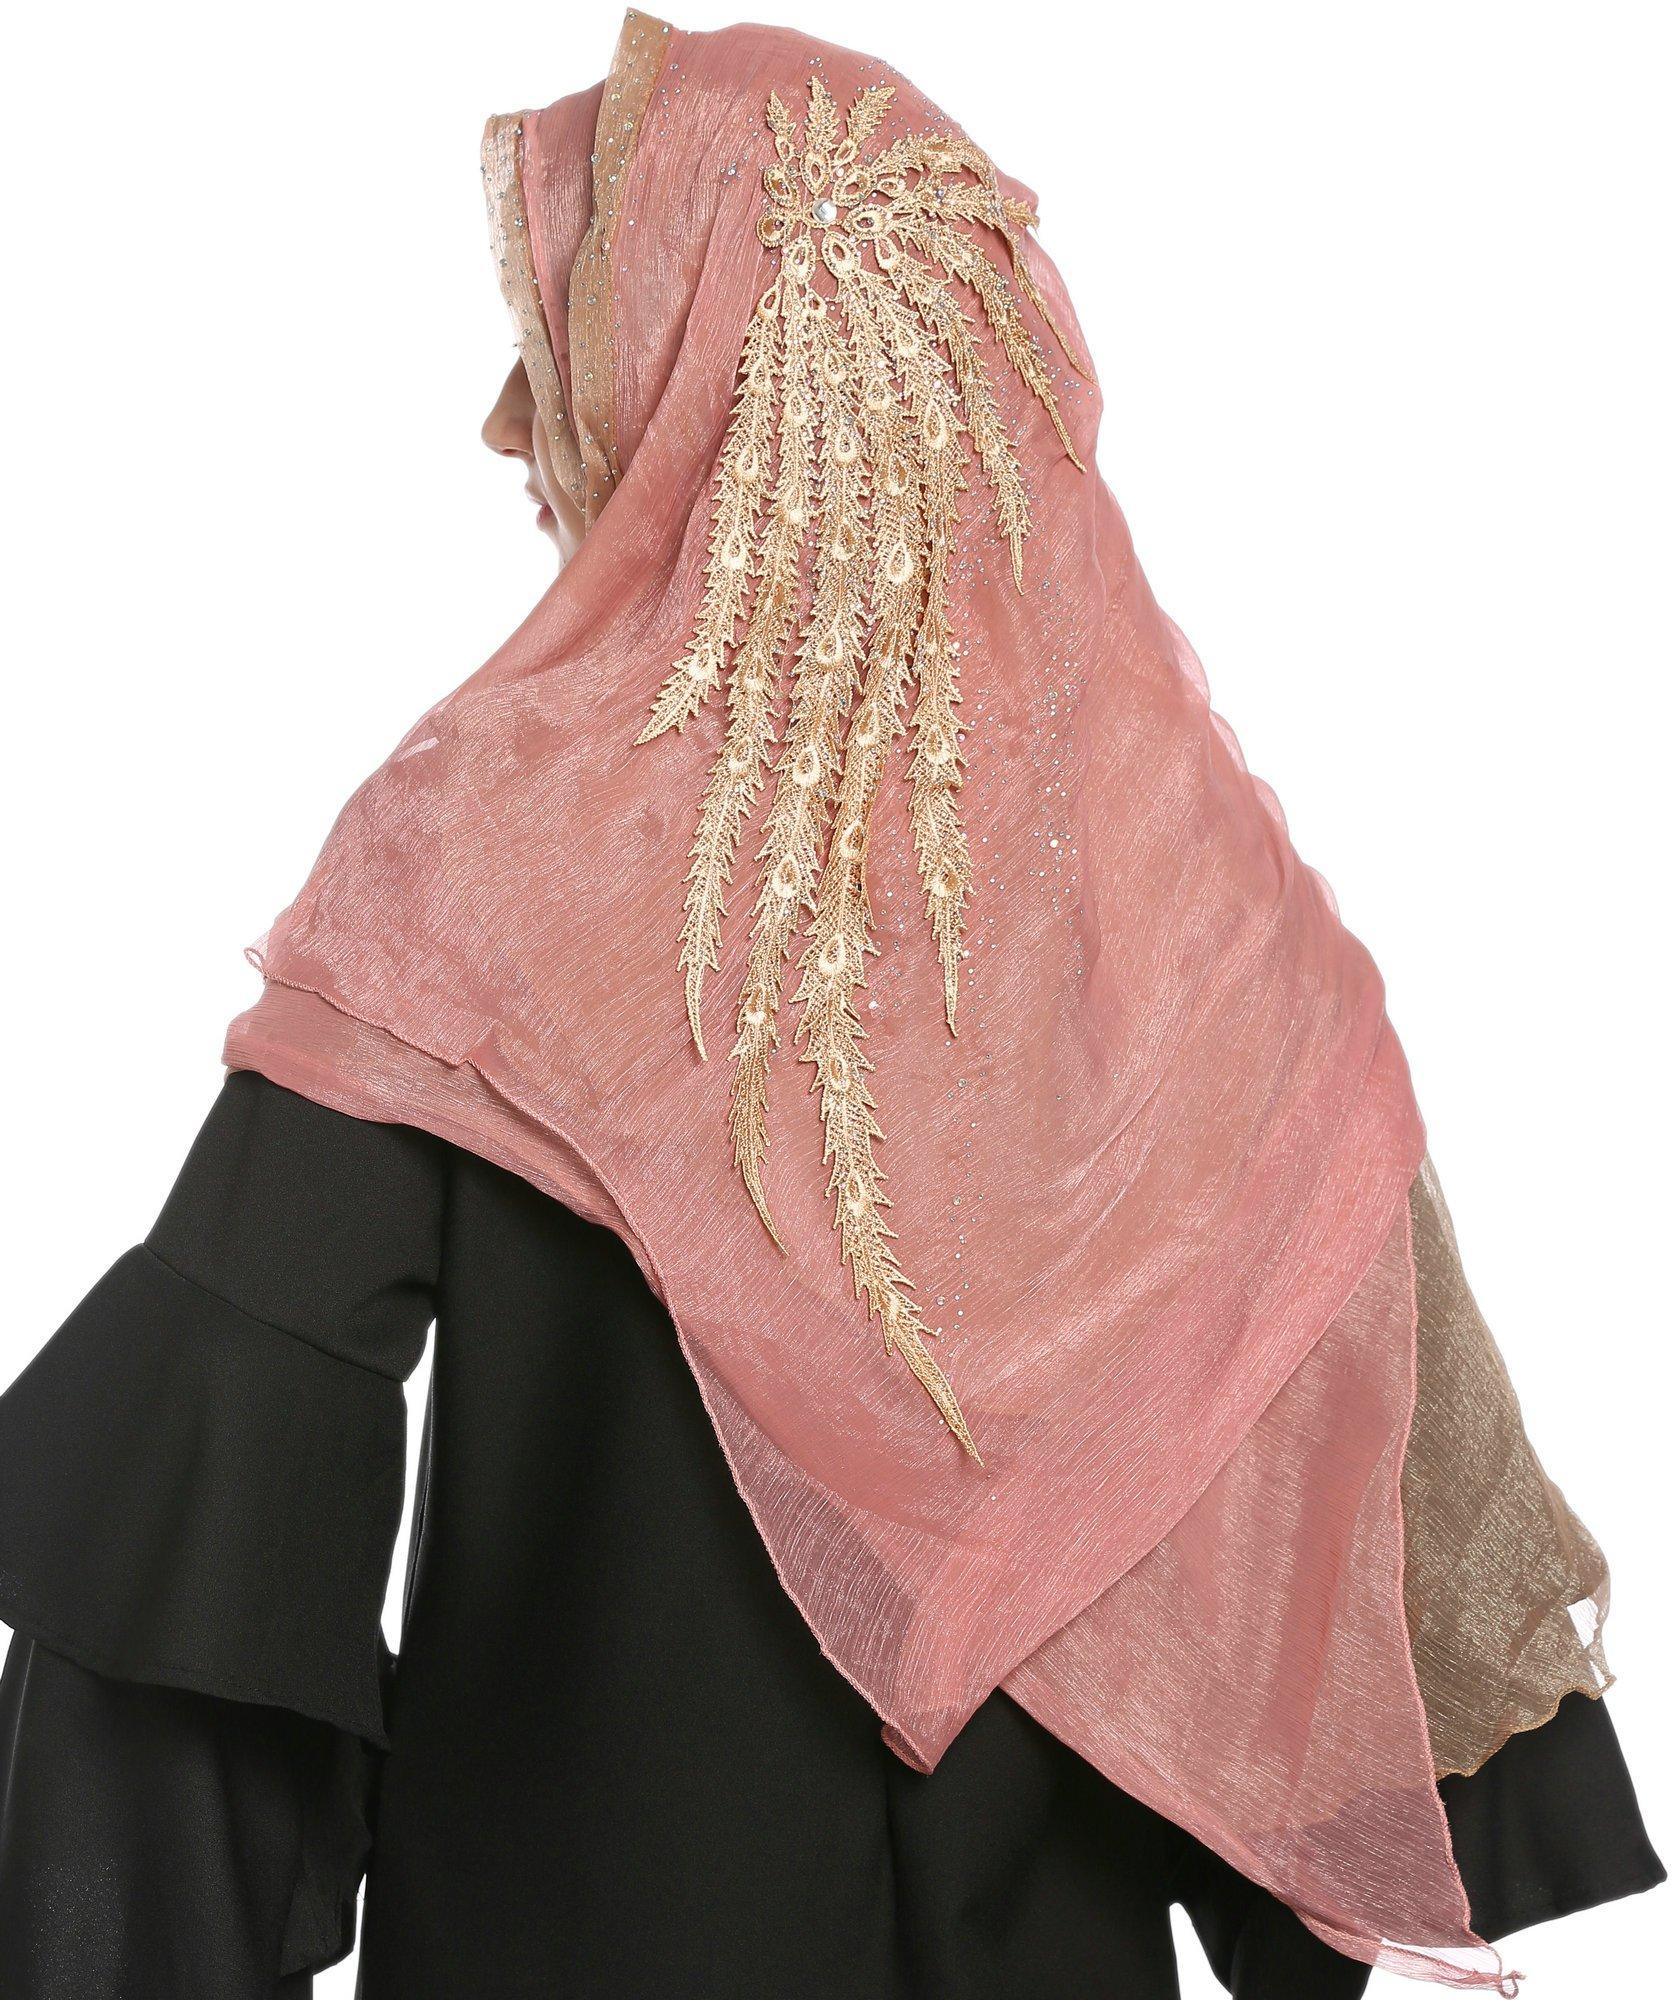 Ababalaya Lace Decorated Wedding Hijab Islamic Hijab,Color3 by Ababalaya (Image #3)